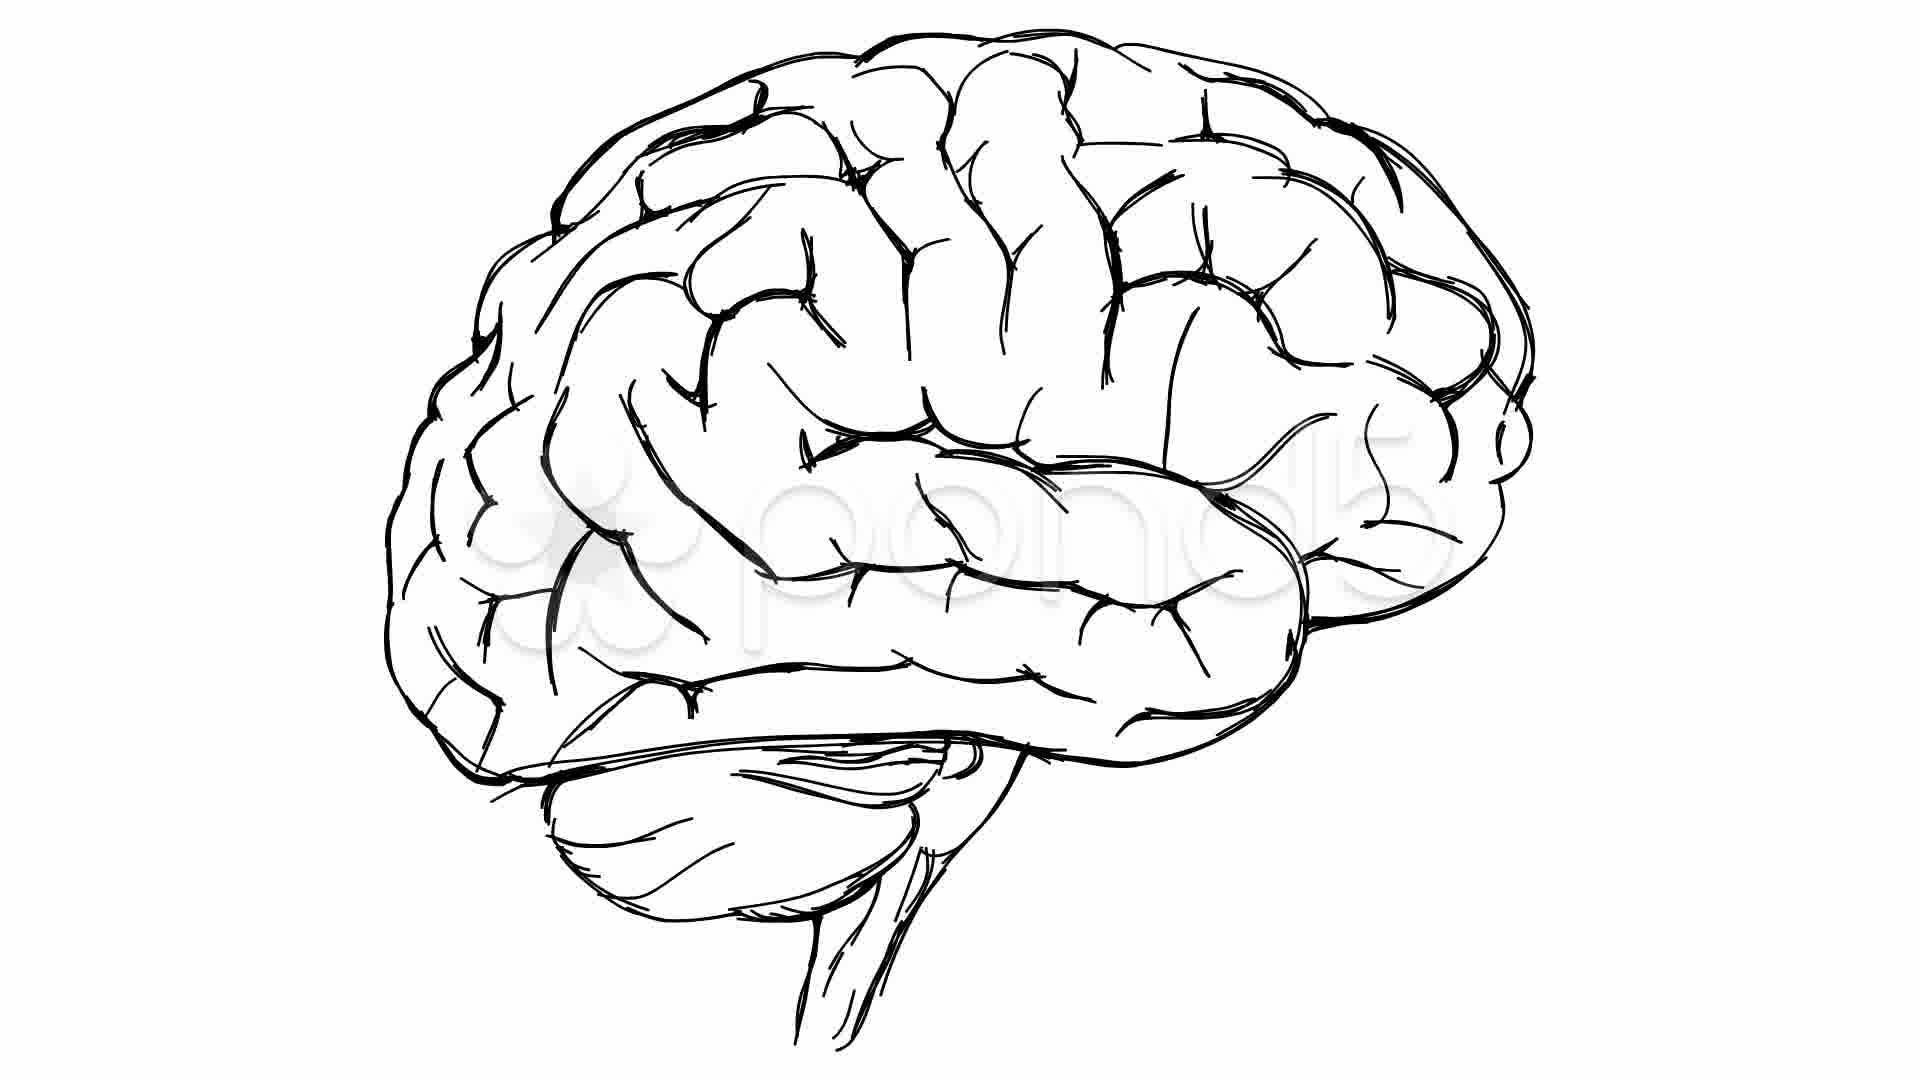 human brain sketch - Google Search | Brain drawing, Brain ...